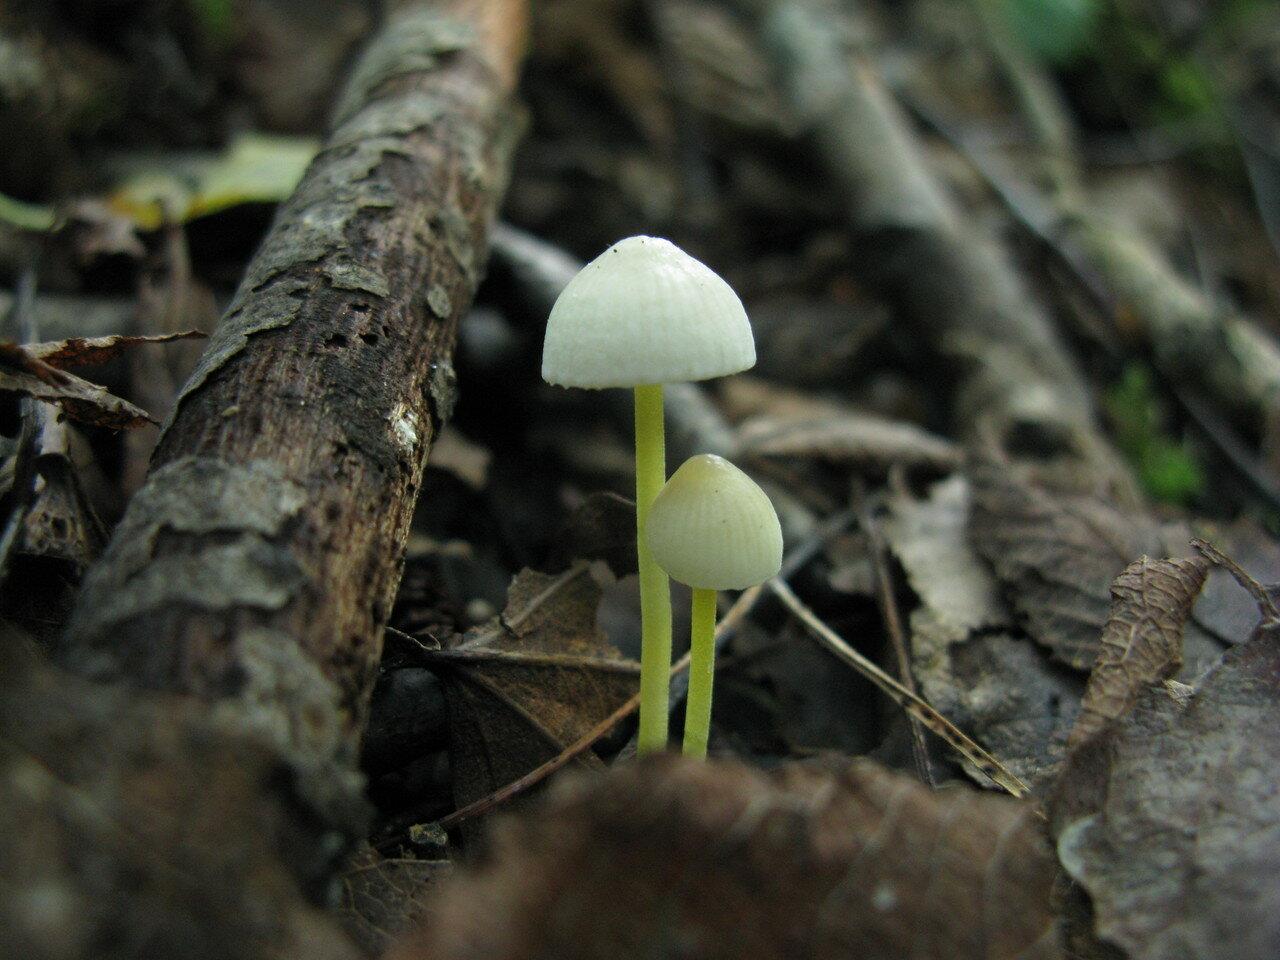 Мицена слизистая (Mycena epipterygia) Автор фото: Станислав Кривошеев